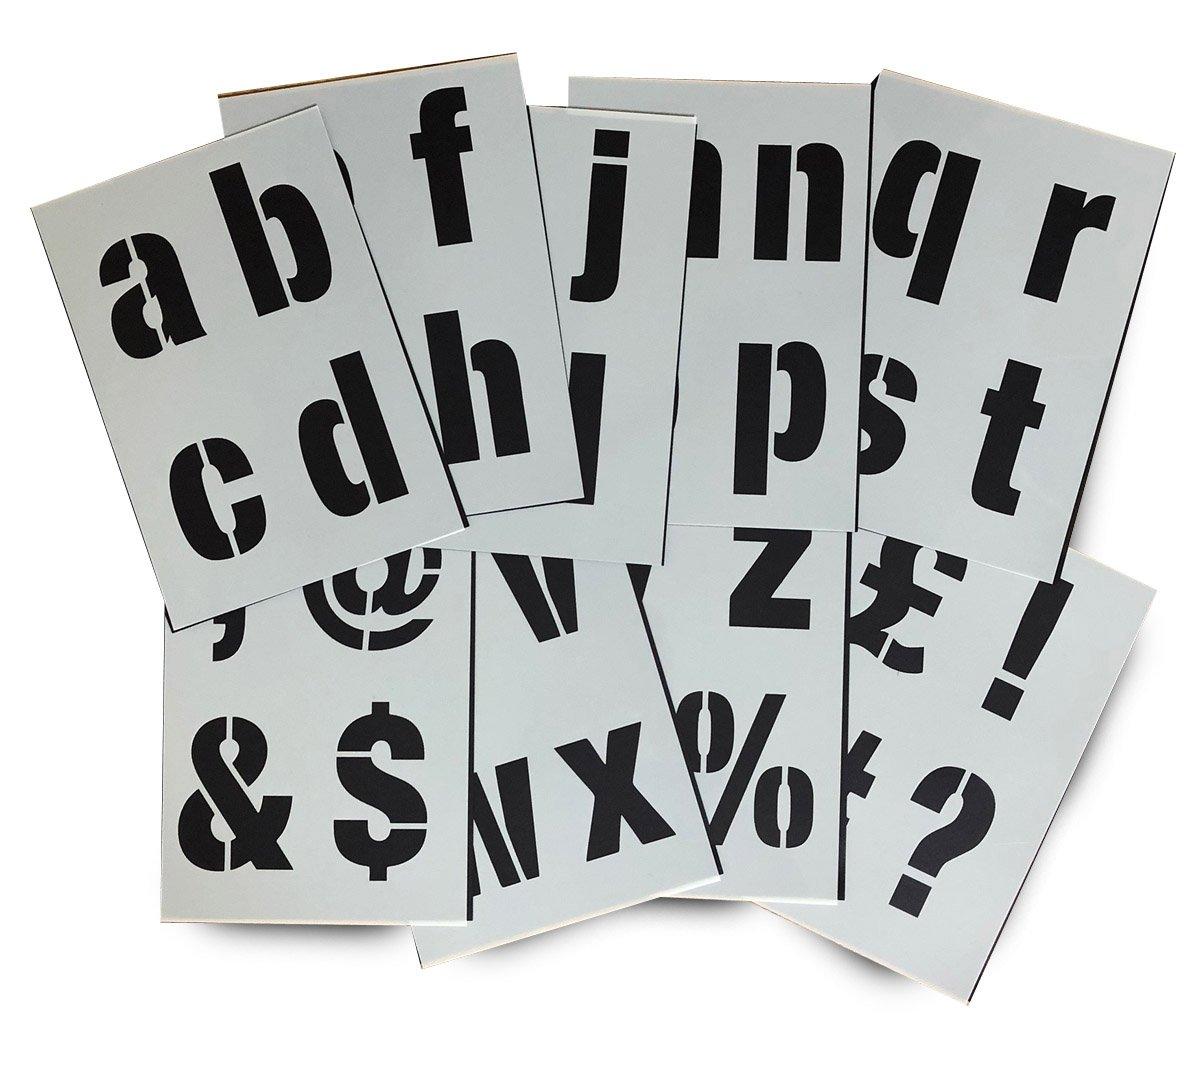 Alphabet Stencil Letters/Symbols 100mm Tall (4